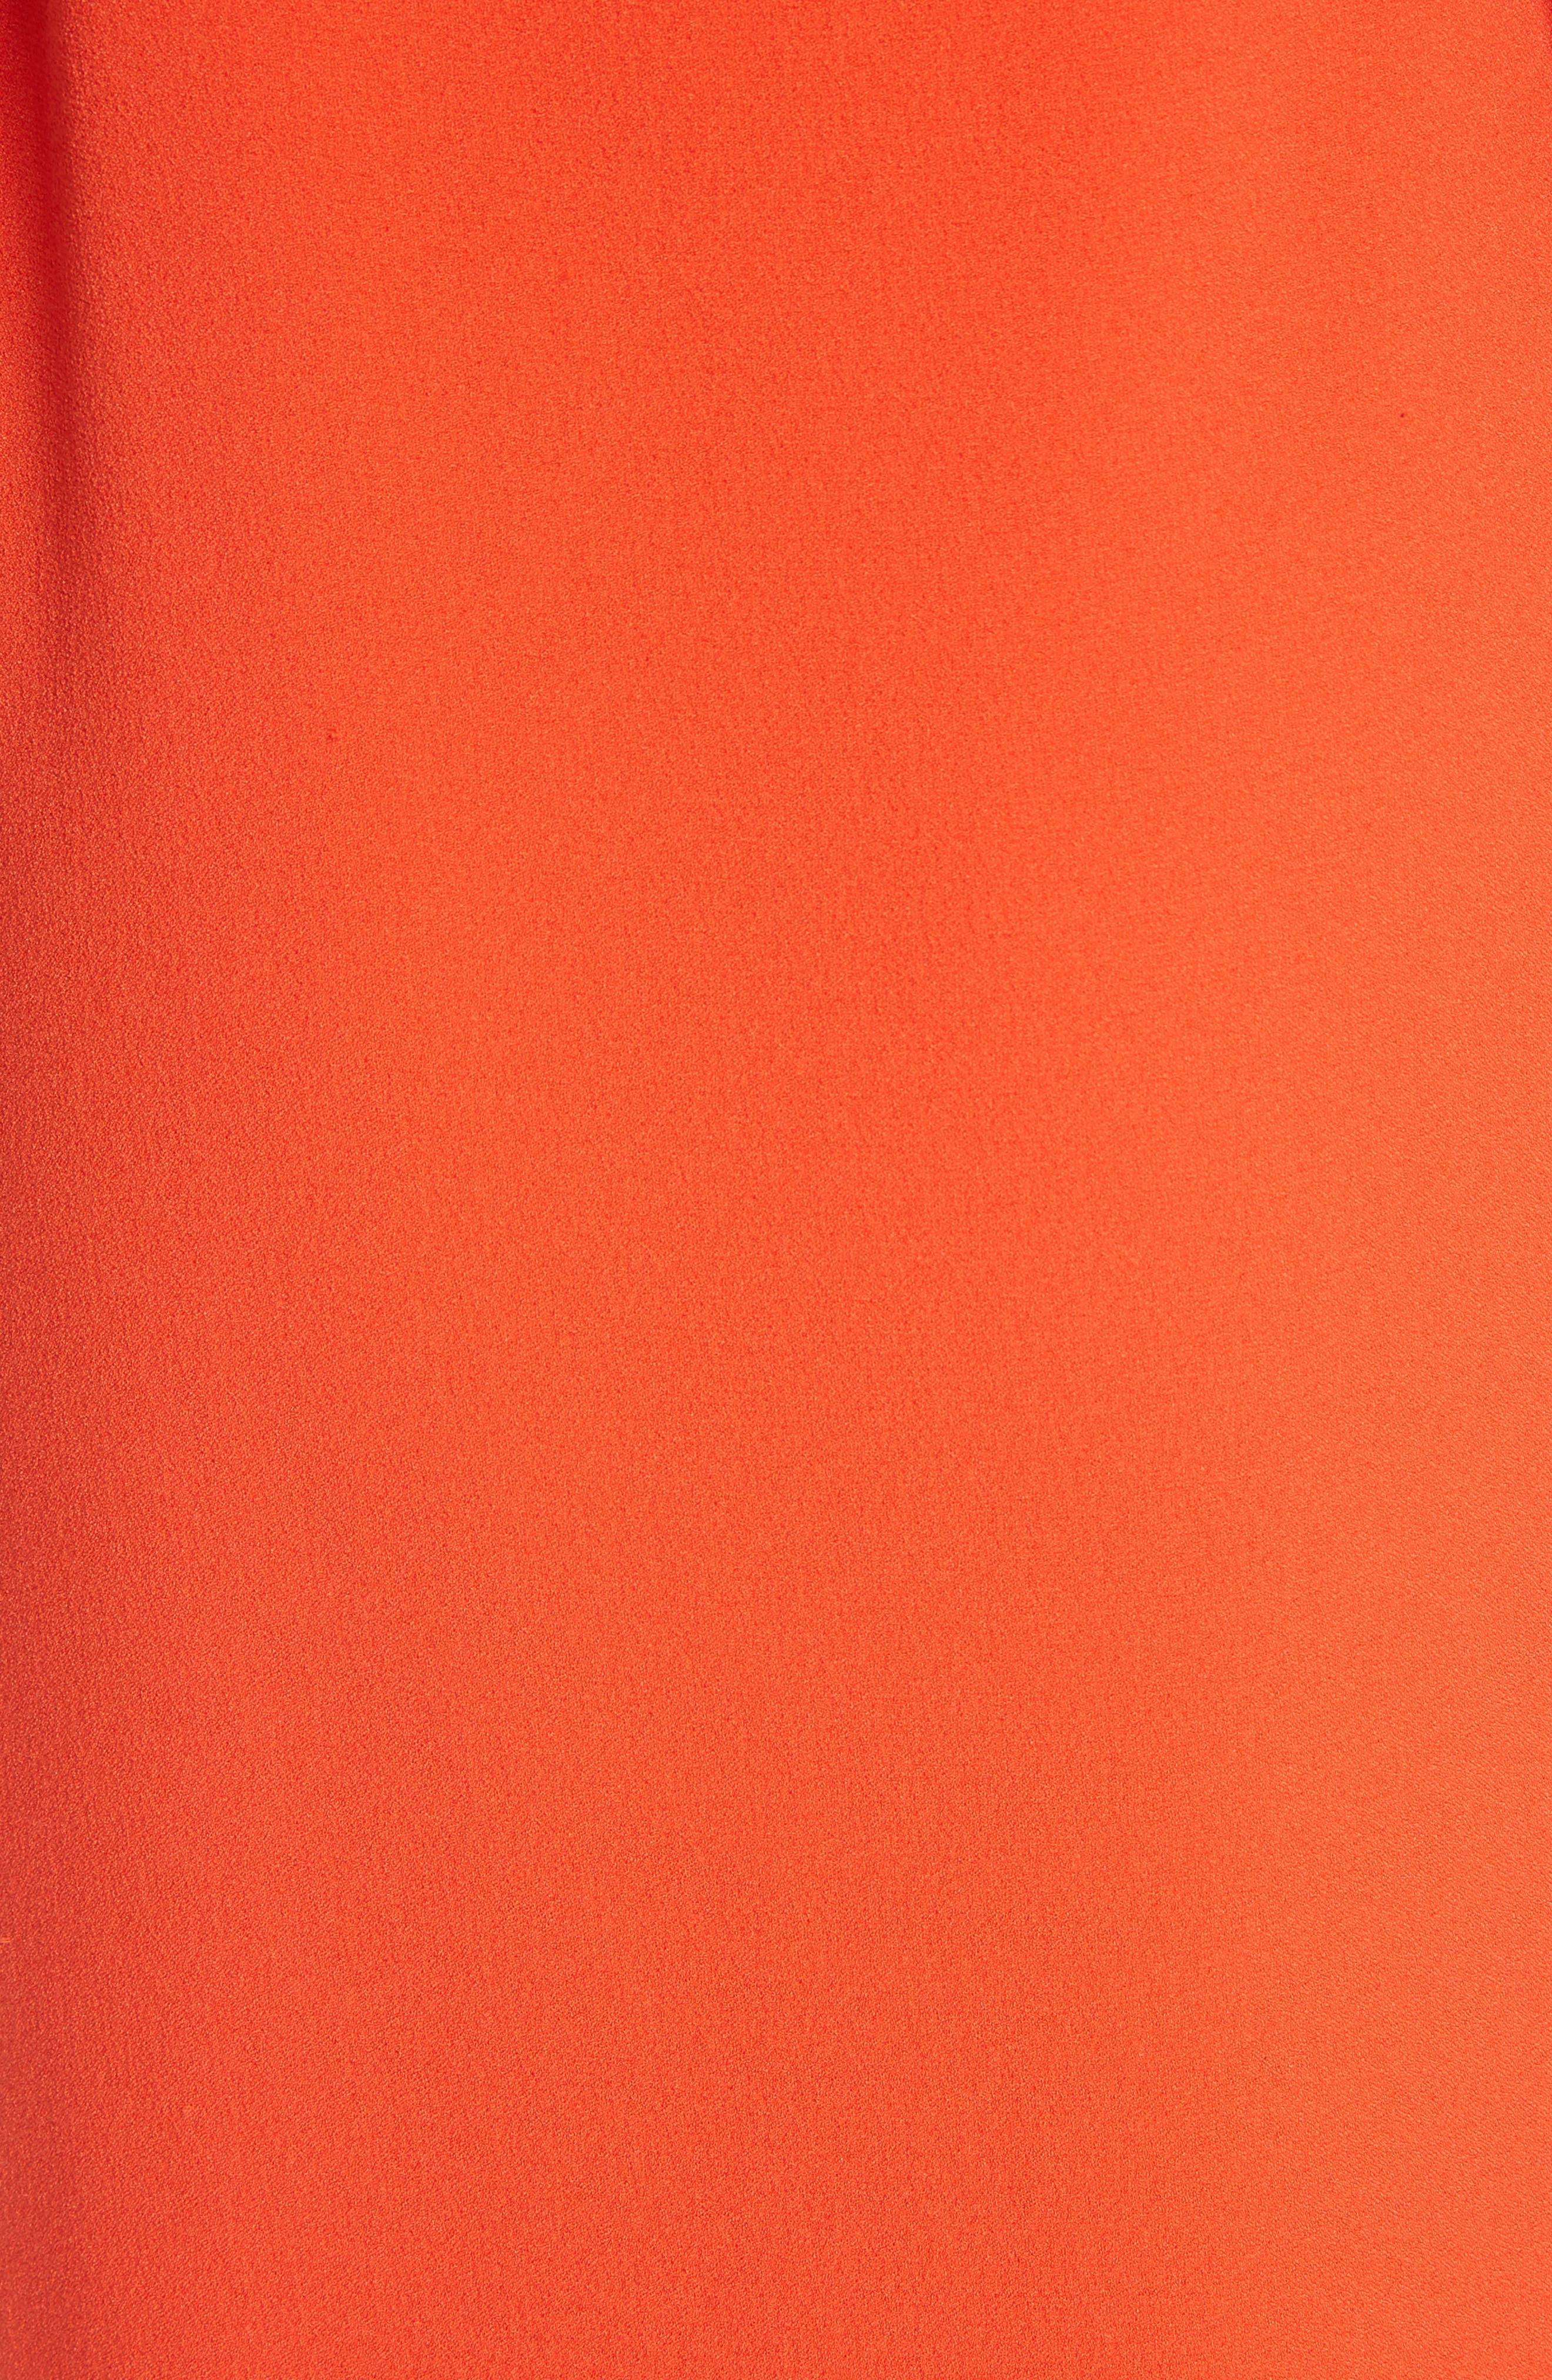 Clark Ruffle Maxi Dress,                             Alternate thumbnail 5, color,                             BIG APPLE RED